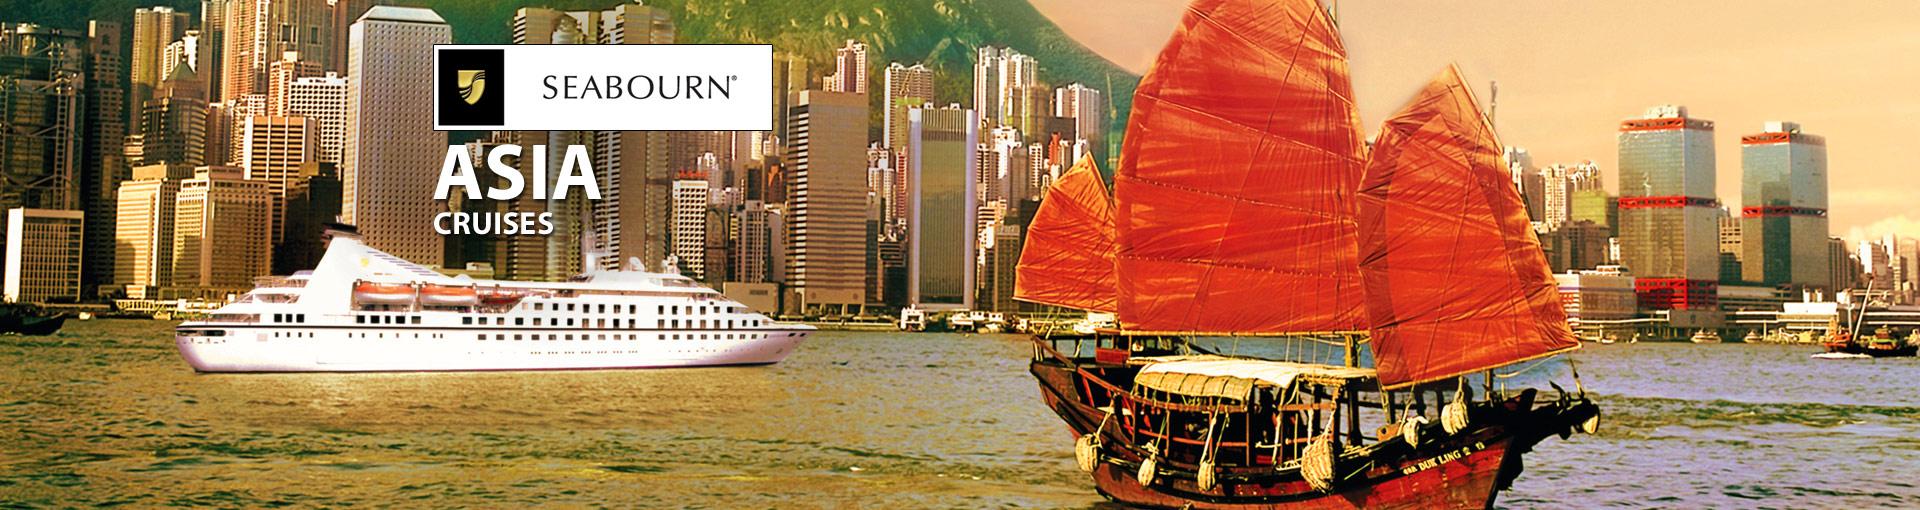 Seabourn Cruise Line Asia Cruises